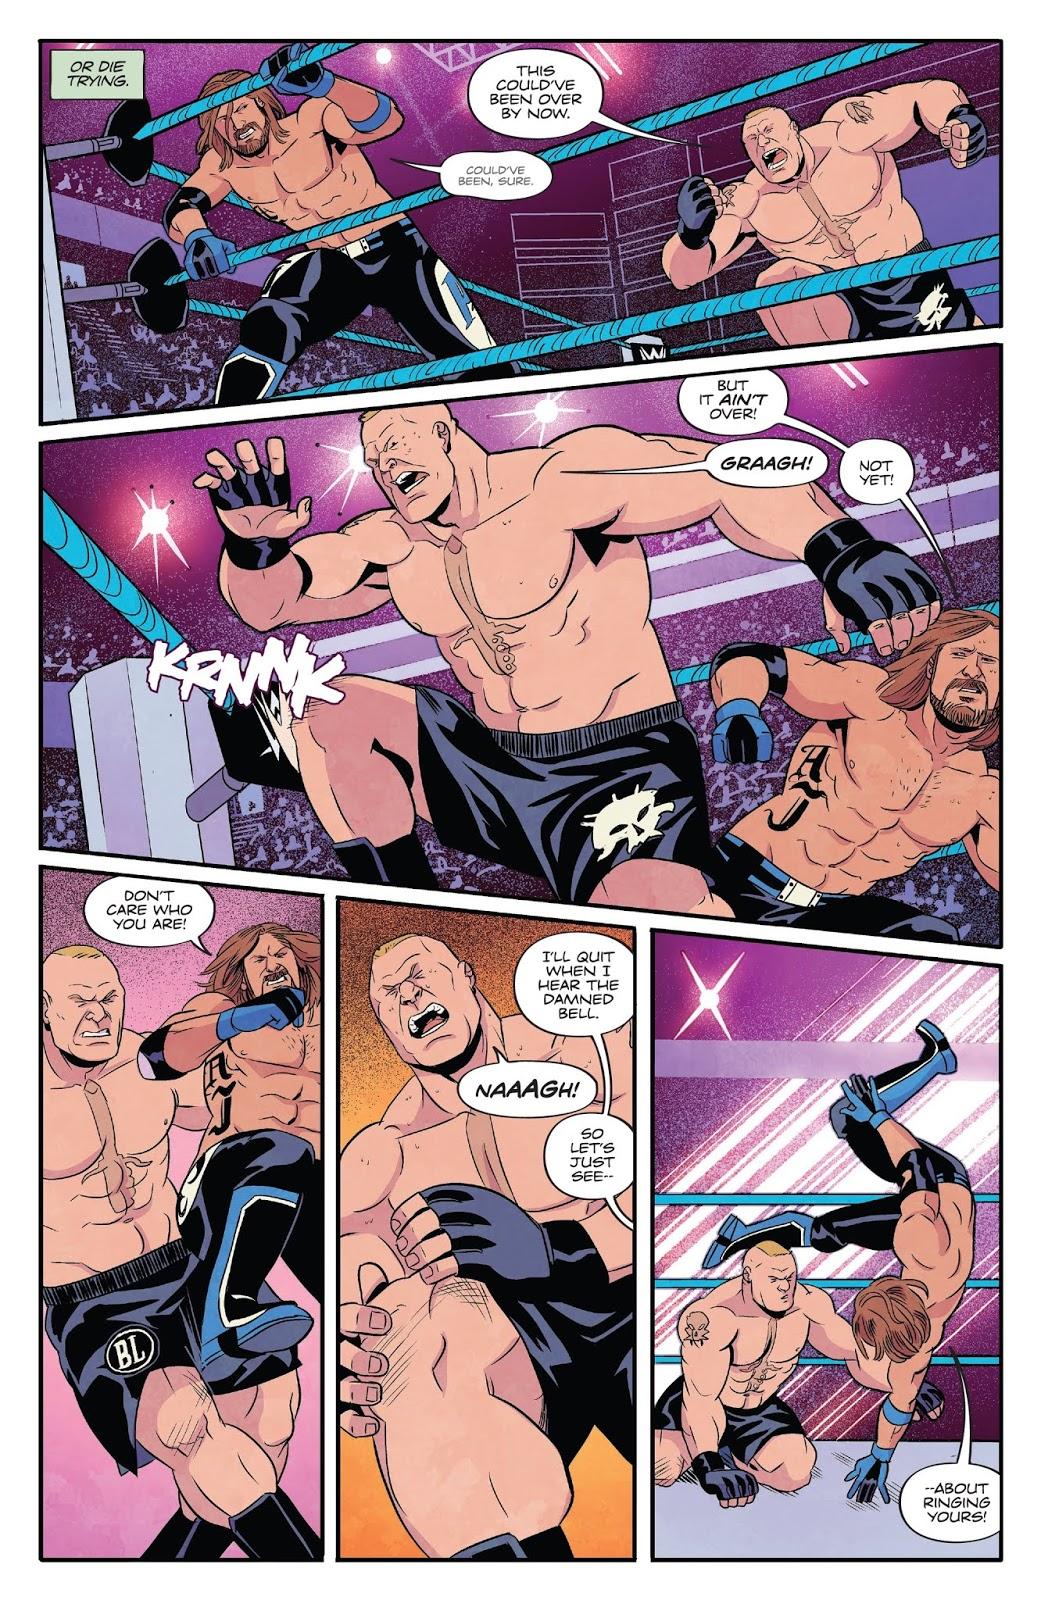 AJ Styles VS Brock Lesnar (Survivor Series 2017)